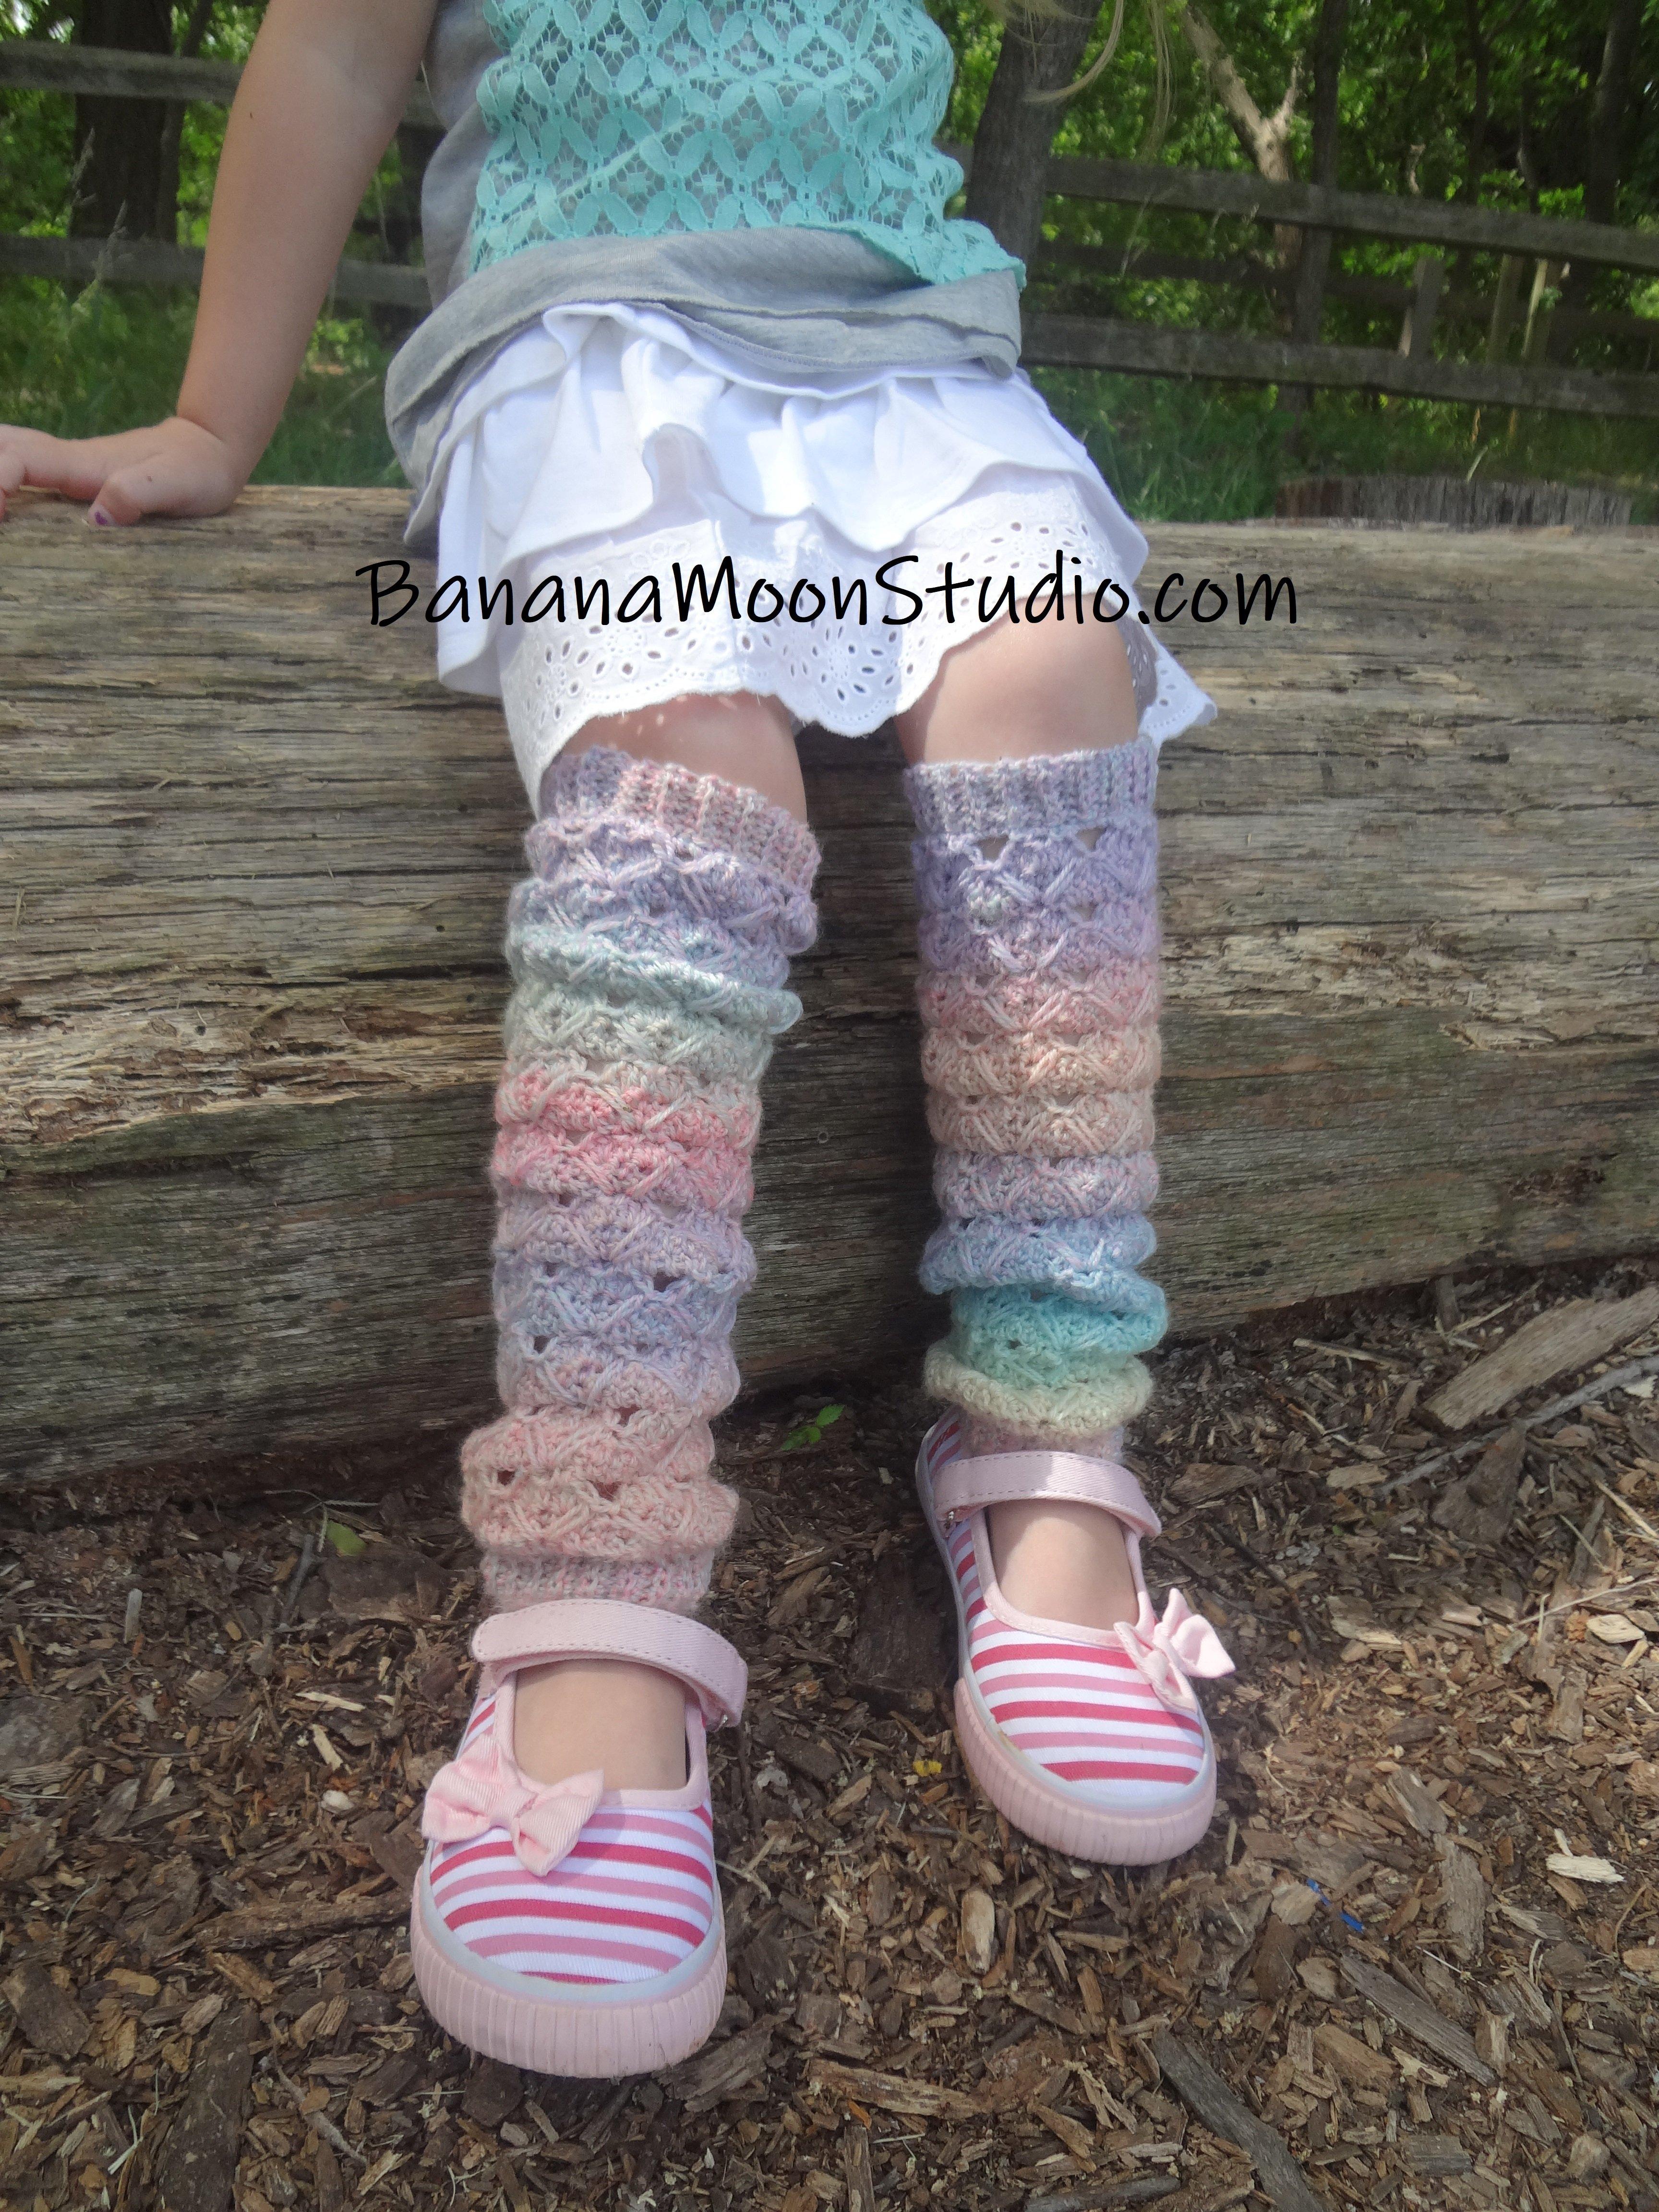 crochet leg warmers pattern child from Banana Moon Studio